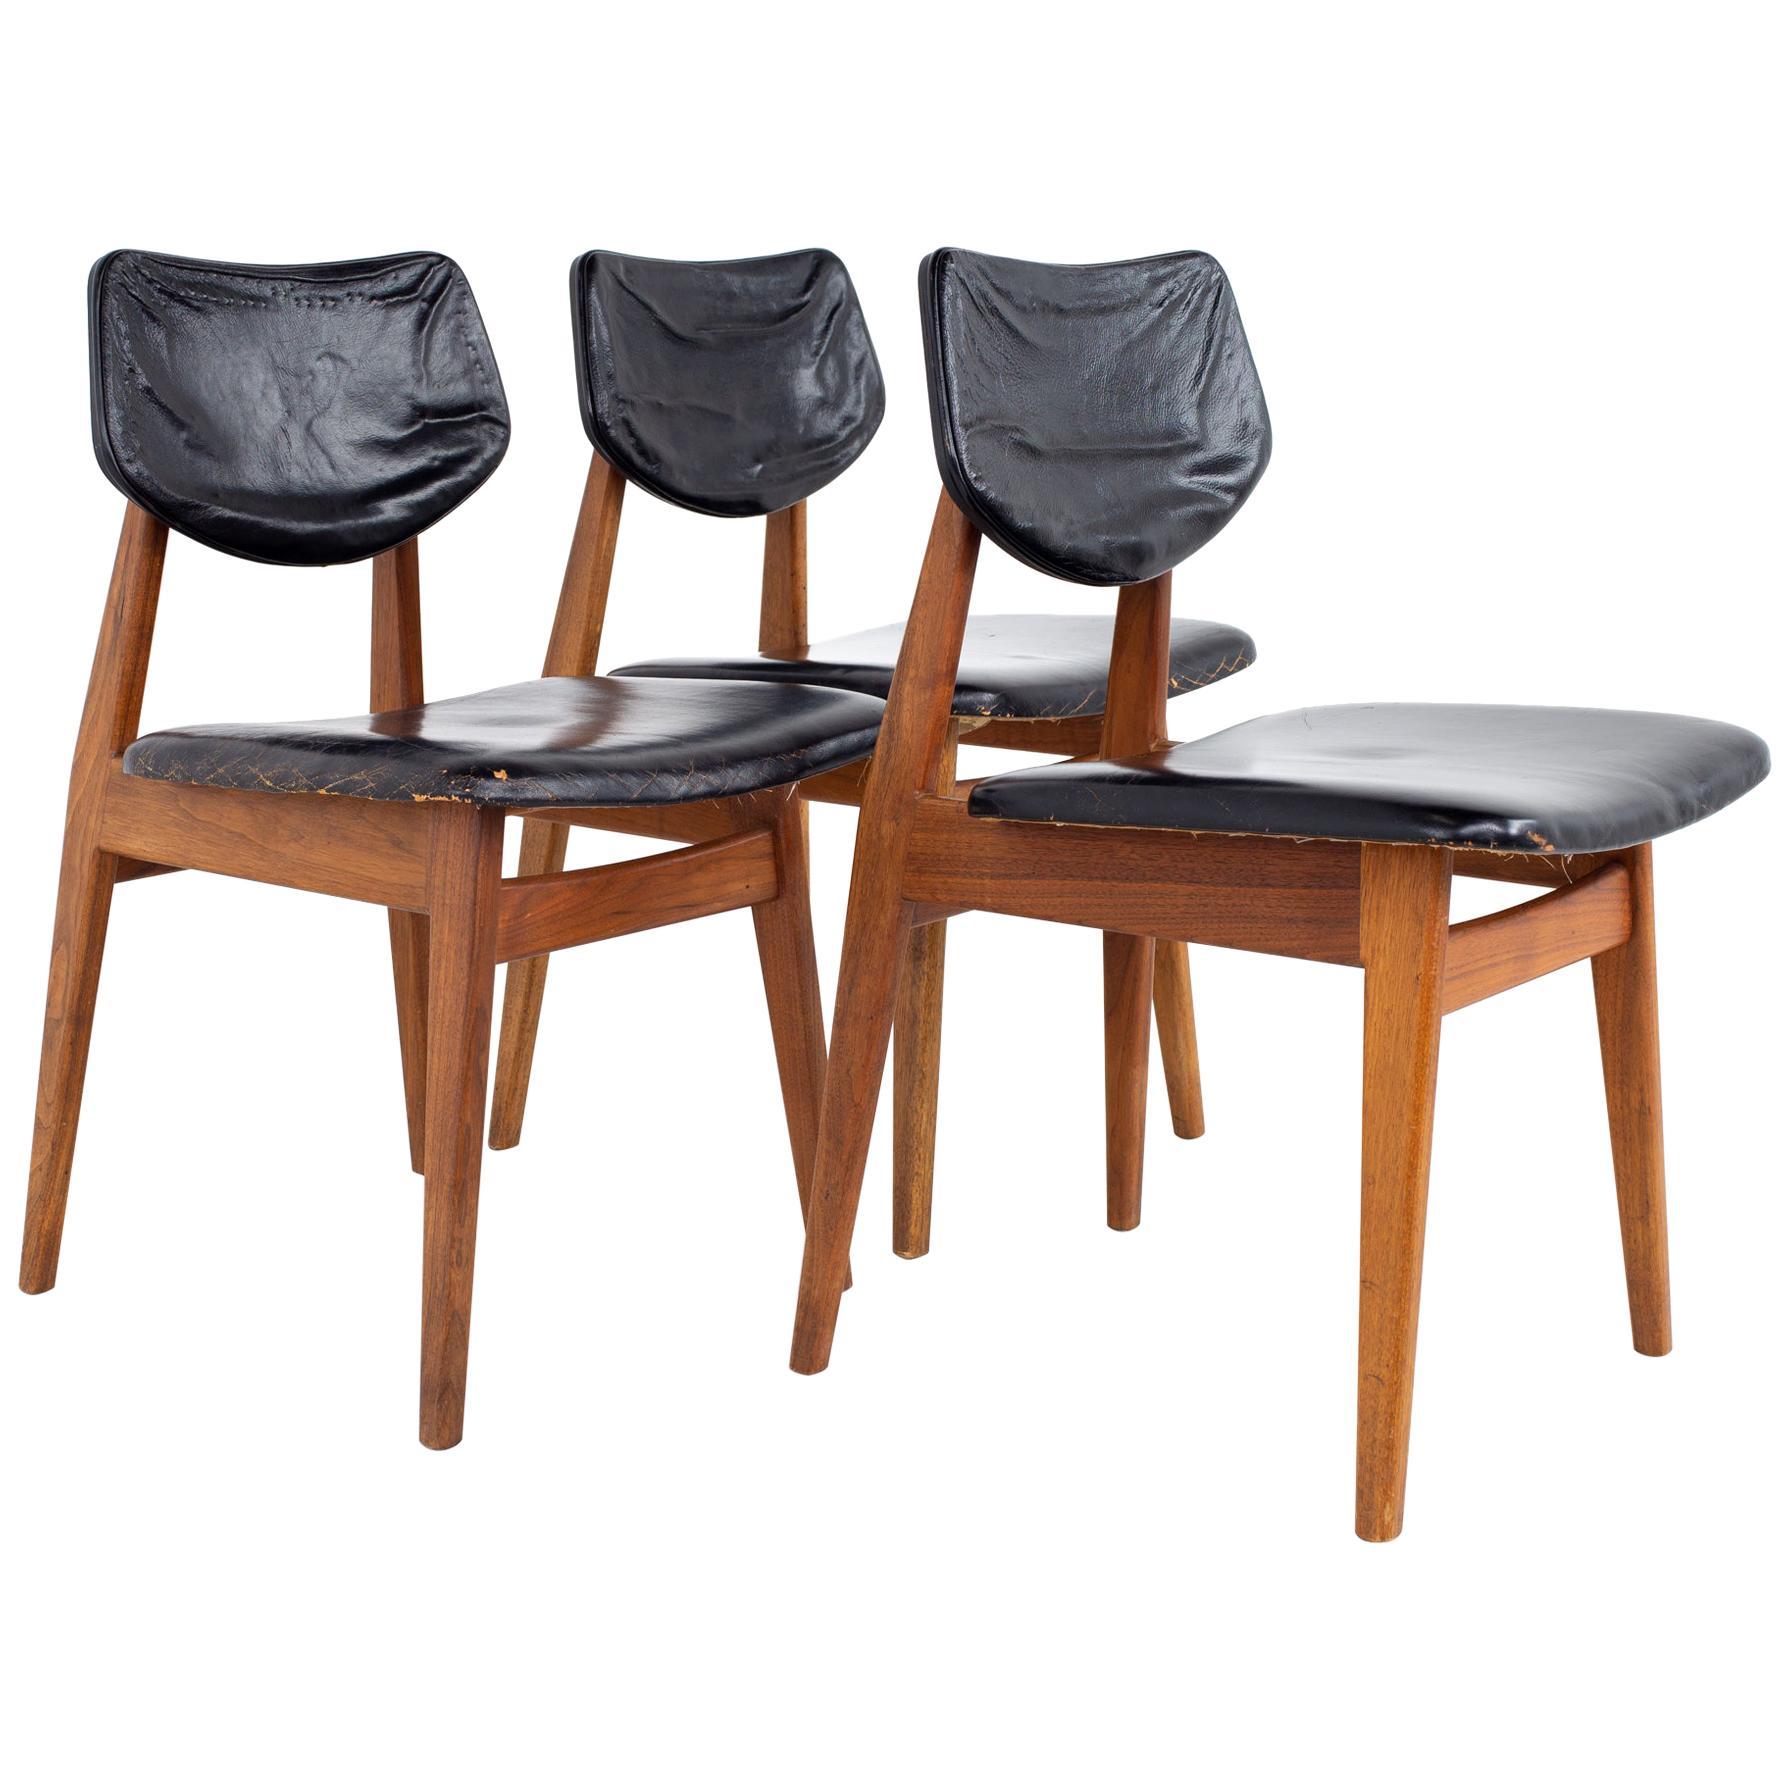 Jens Risom Mid Century Walnut Dining Chairs, Set of 3